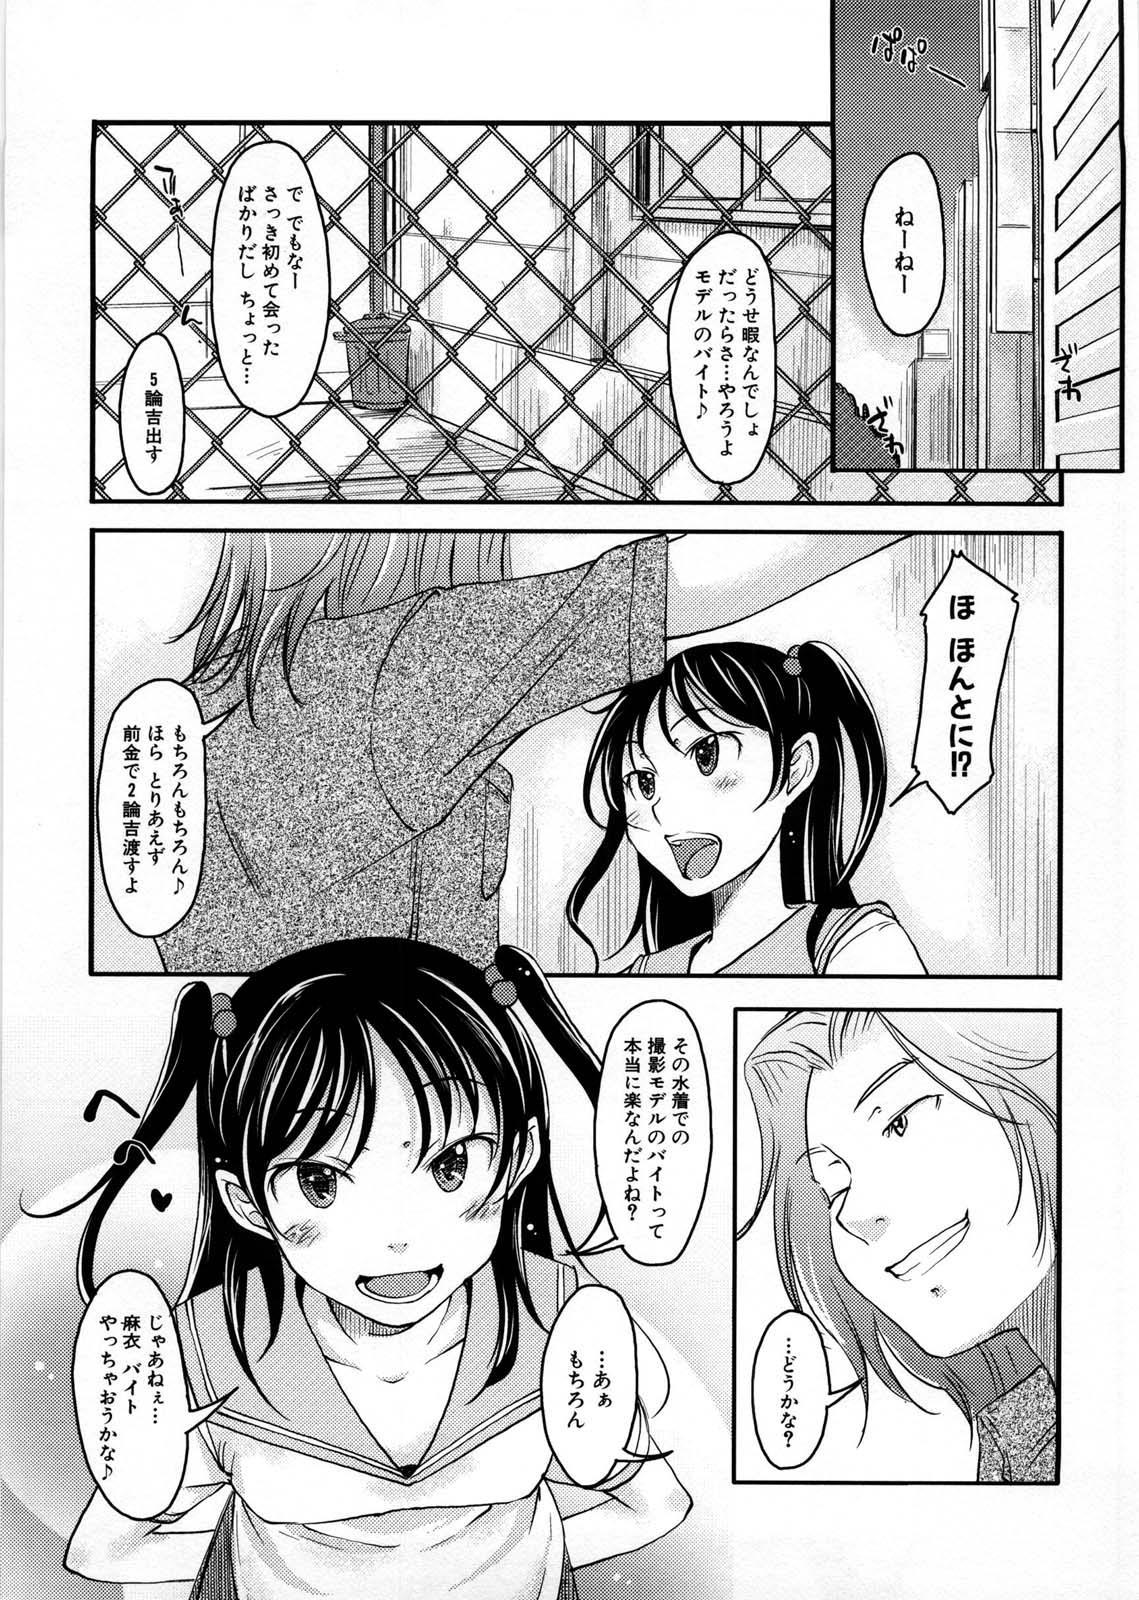 Imouto Ijou Hahaoya Miman 153